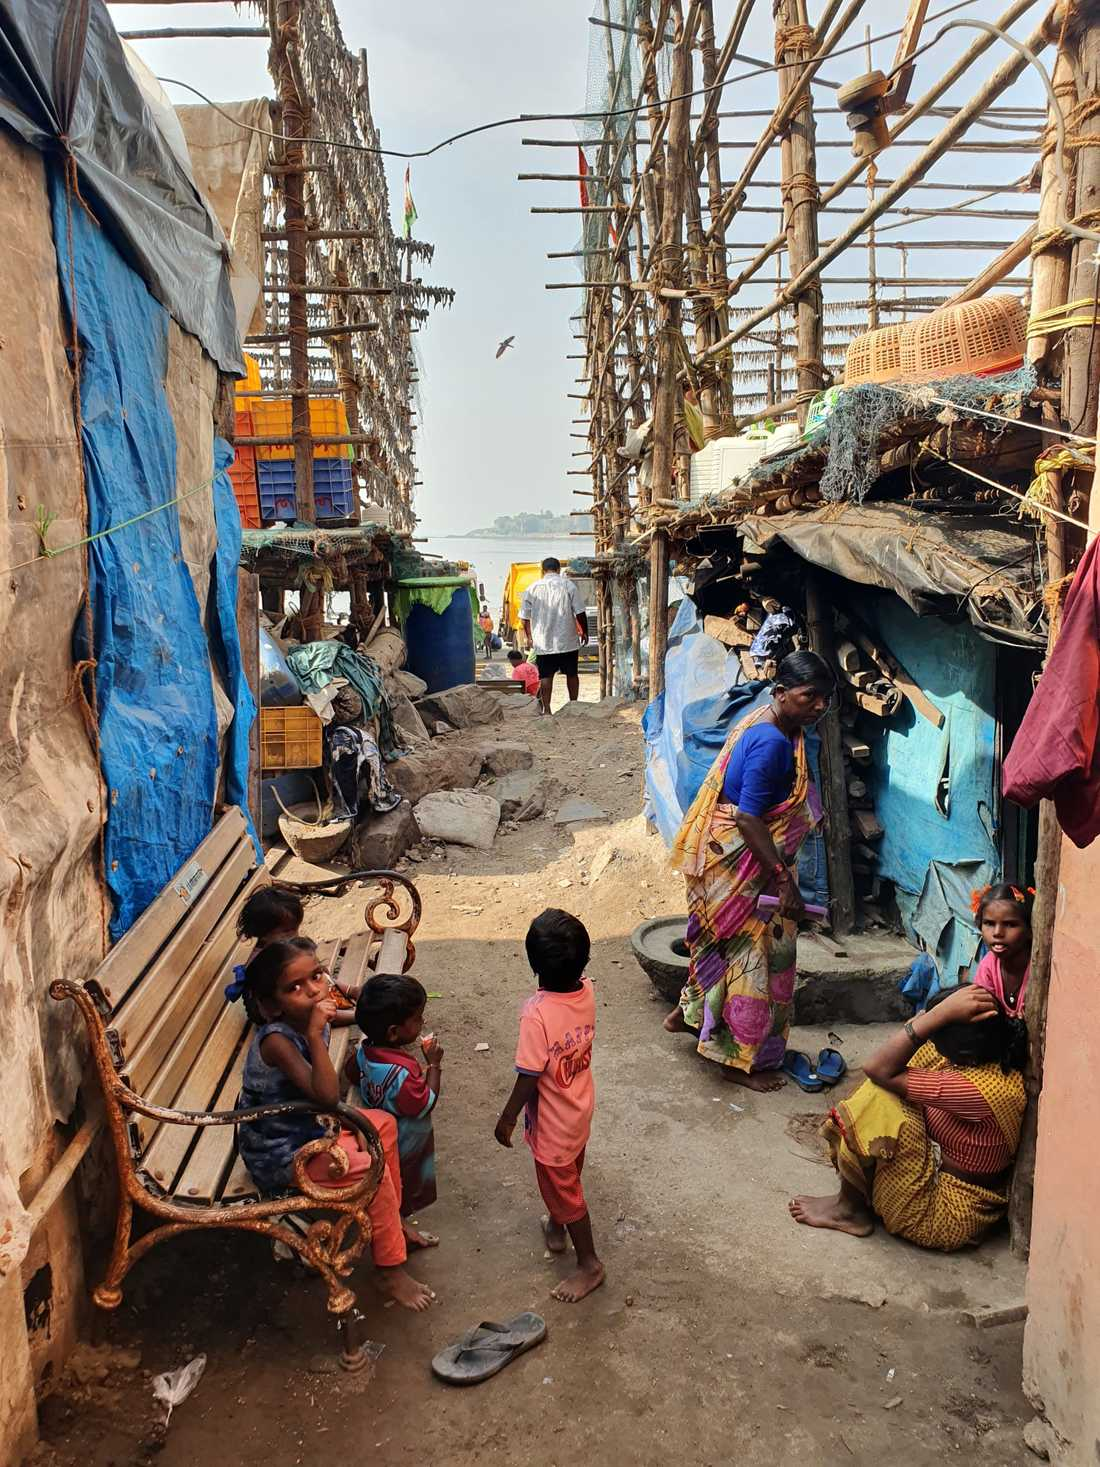 Slummen bakom Versova beach i Mumbai. Hit kom aldrig kungaparet.